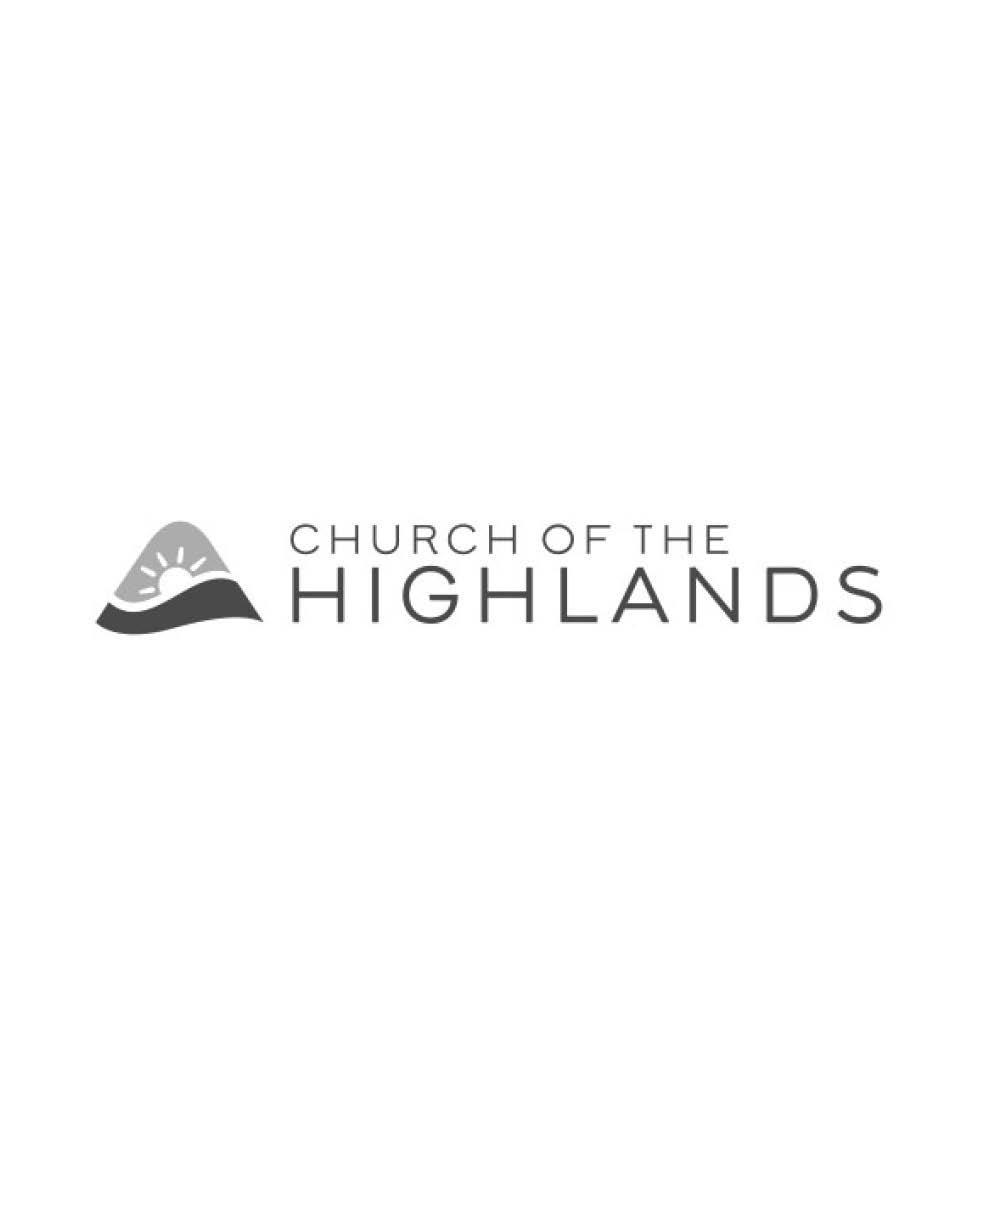 Church of the Highlands Logo .jpg